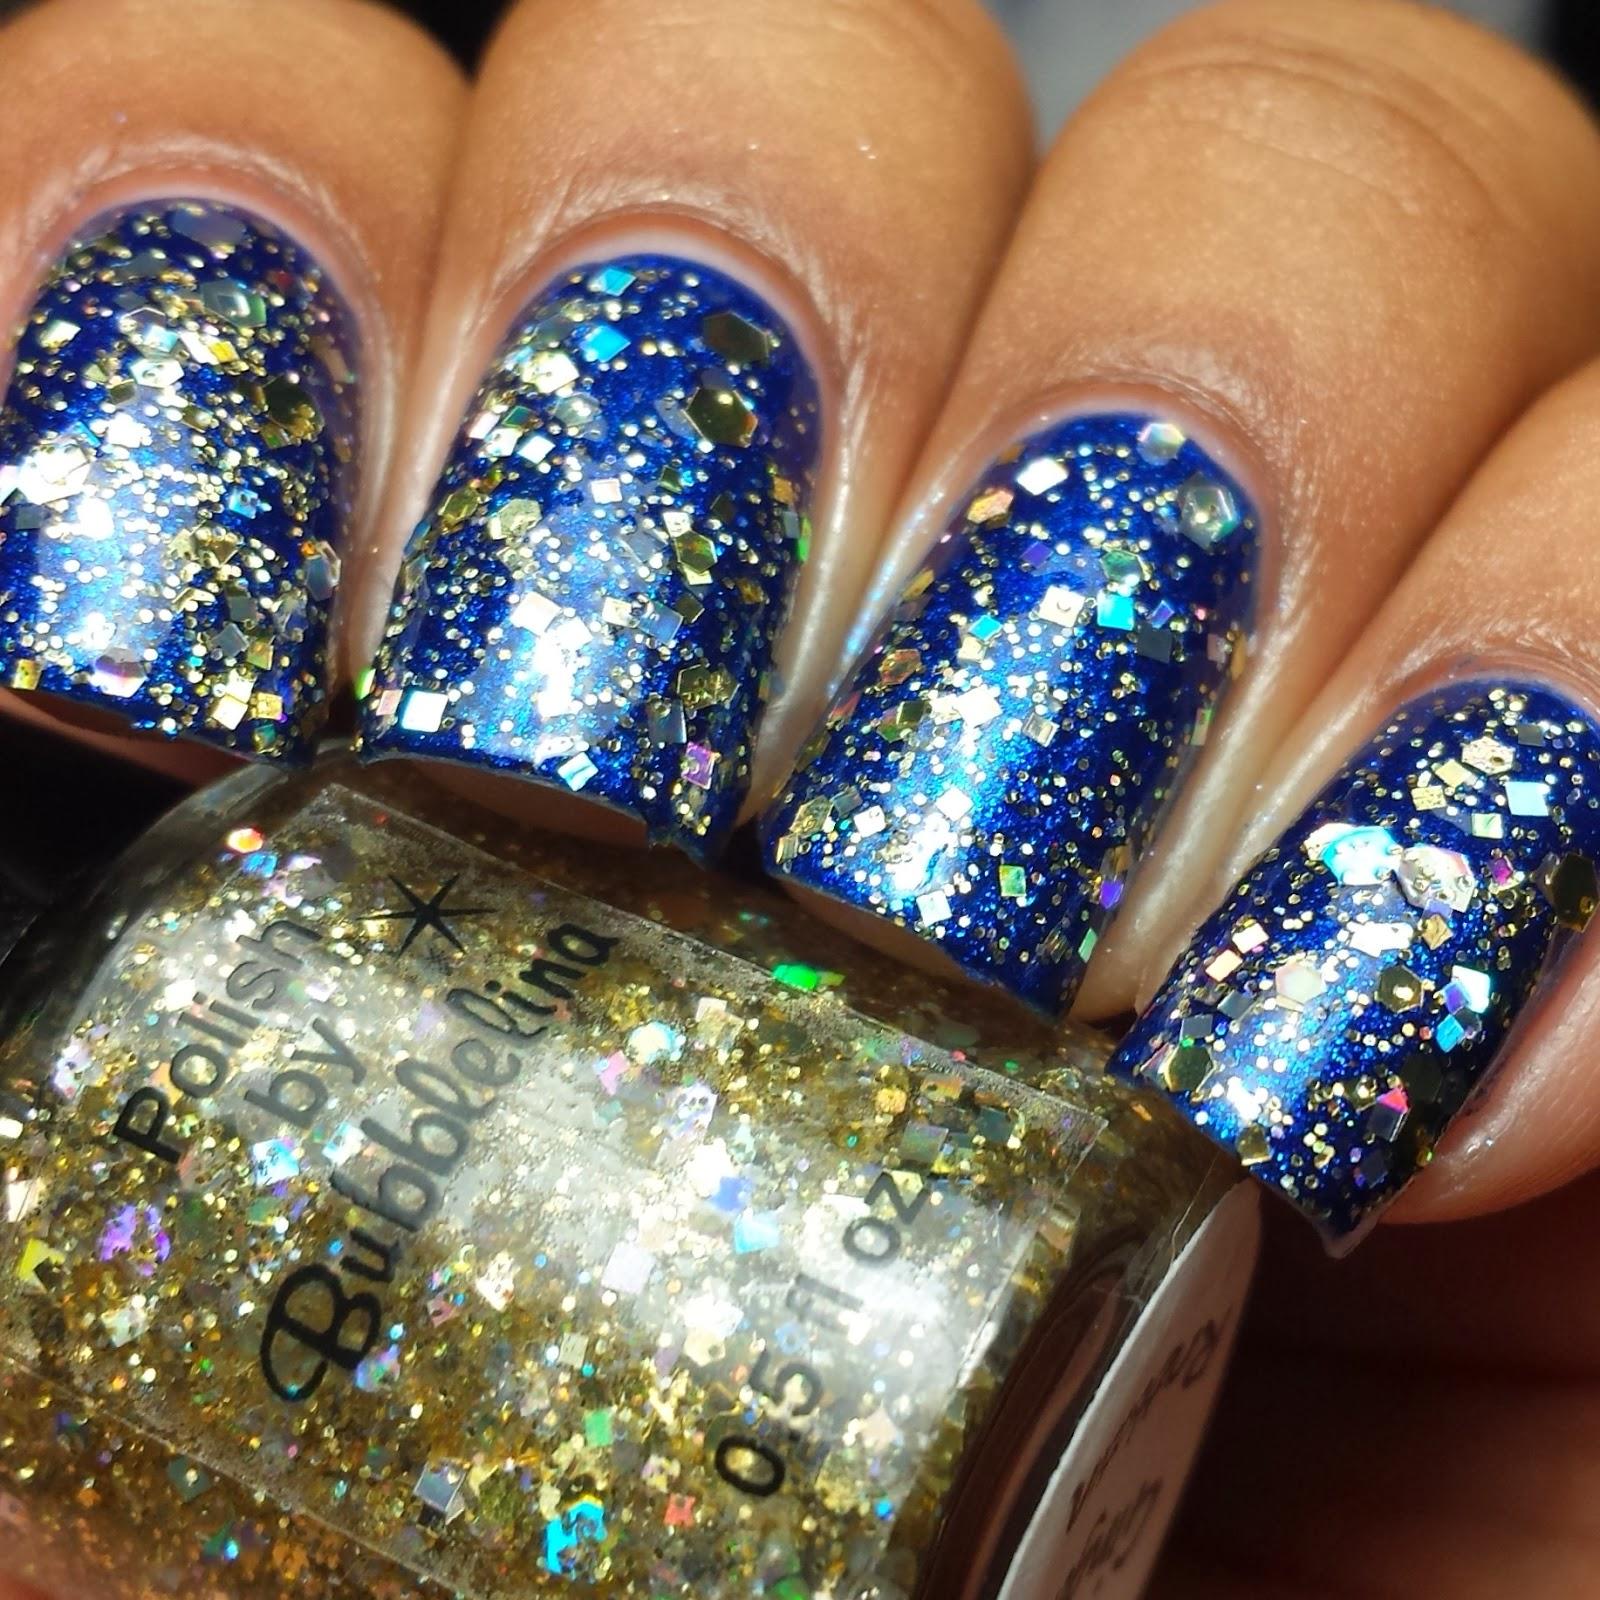 Casino ginger nails / Best Casino Online